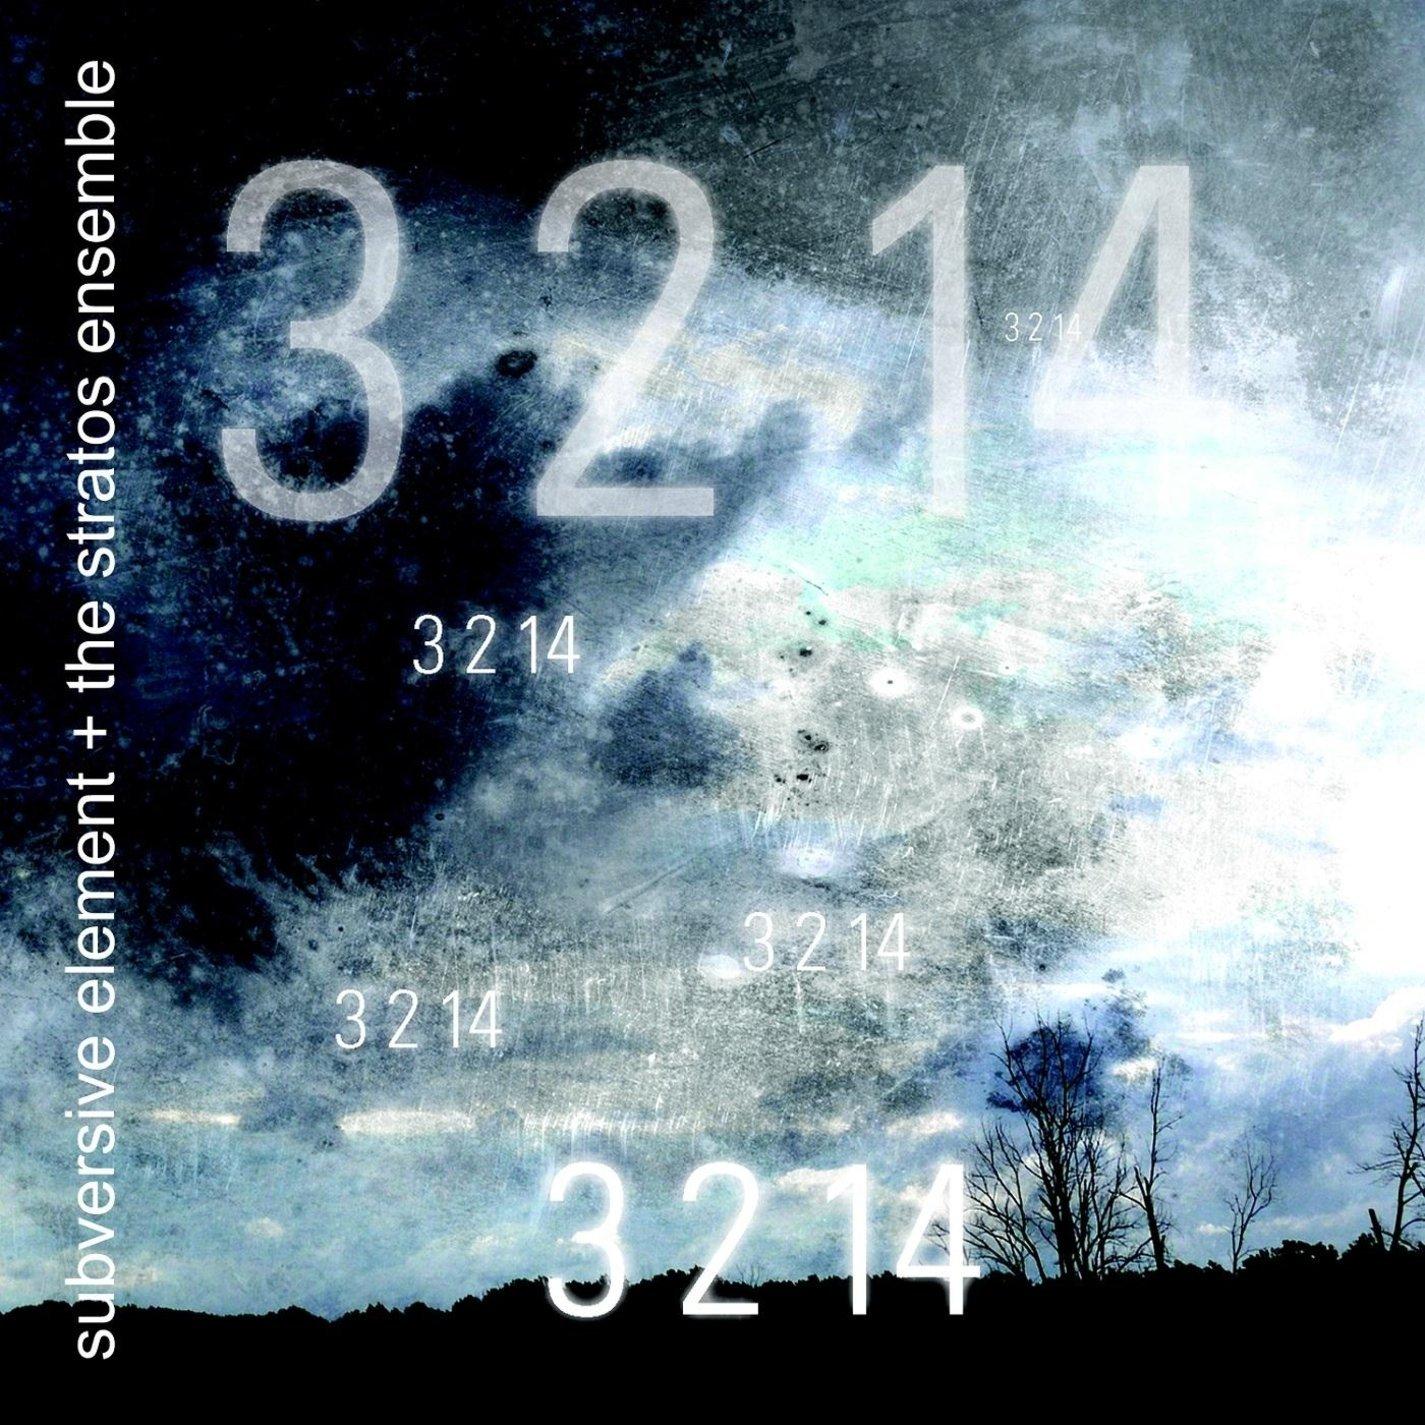 Subversive Element + The Stratos Ensemble — 3 2 14